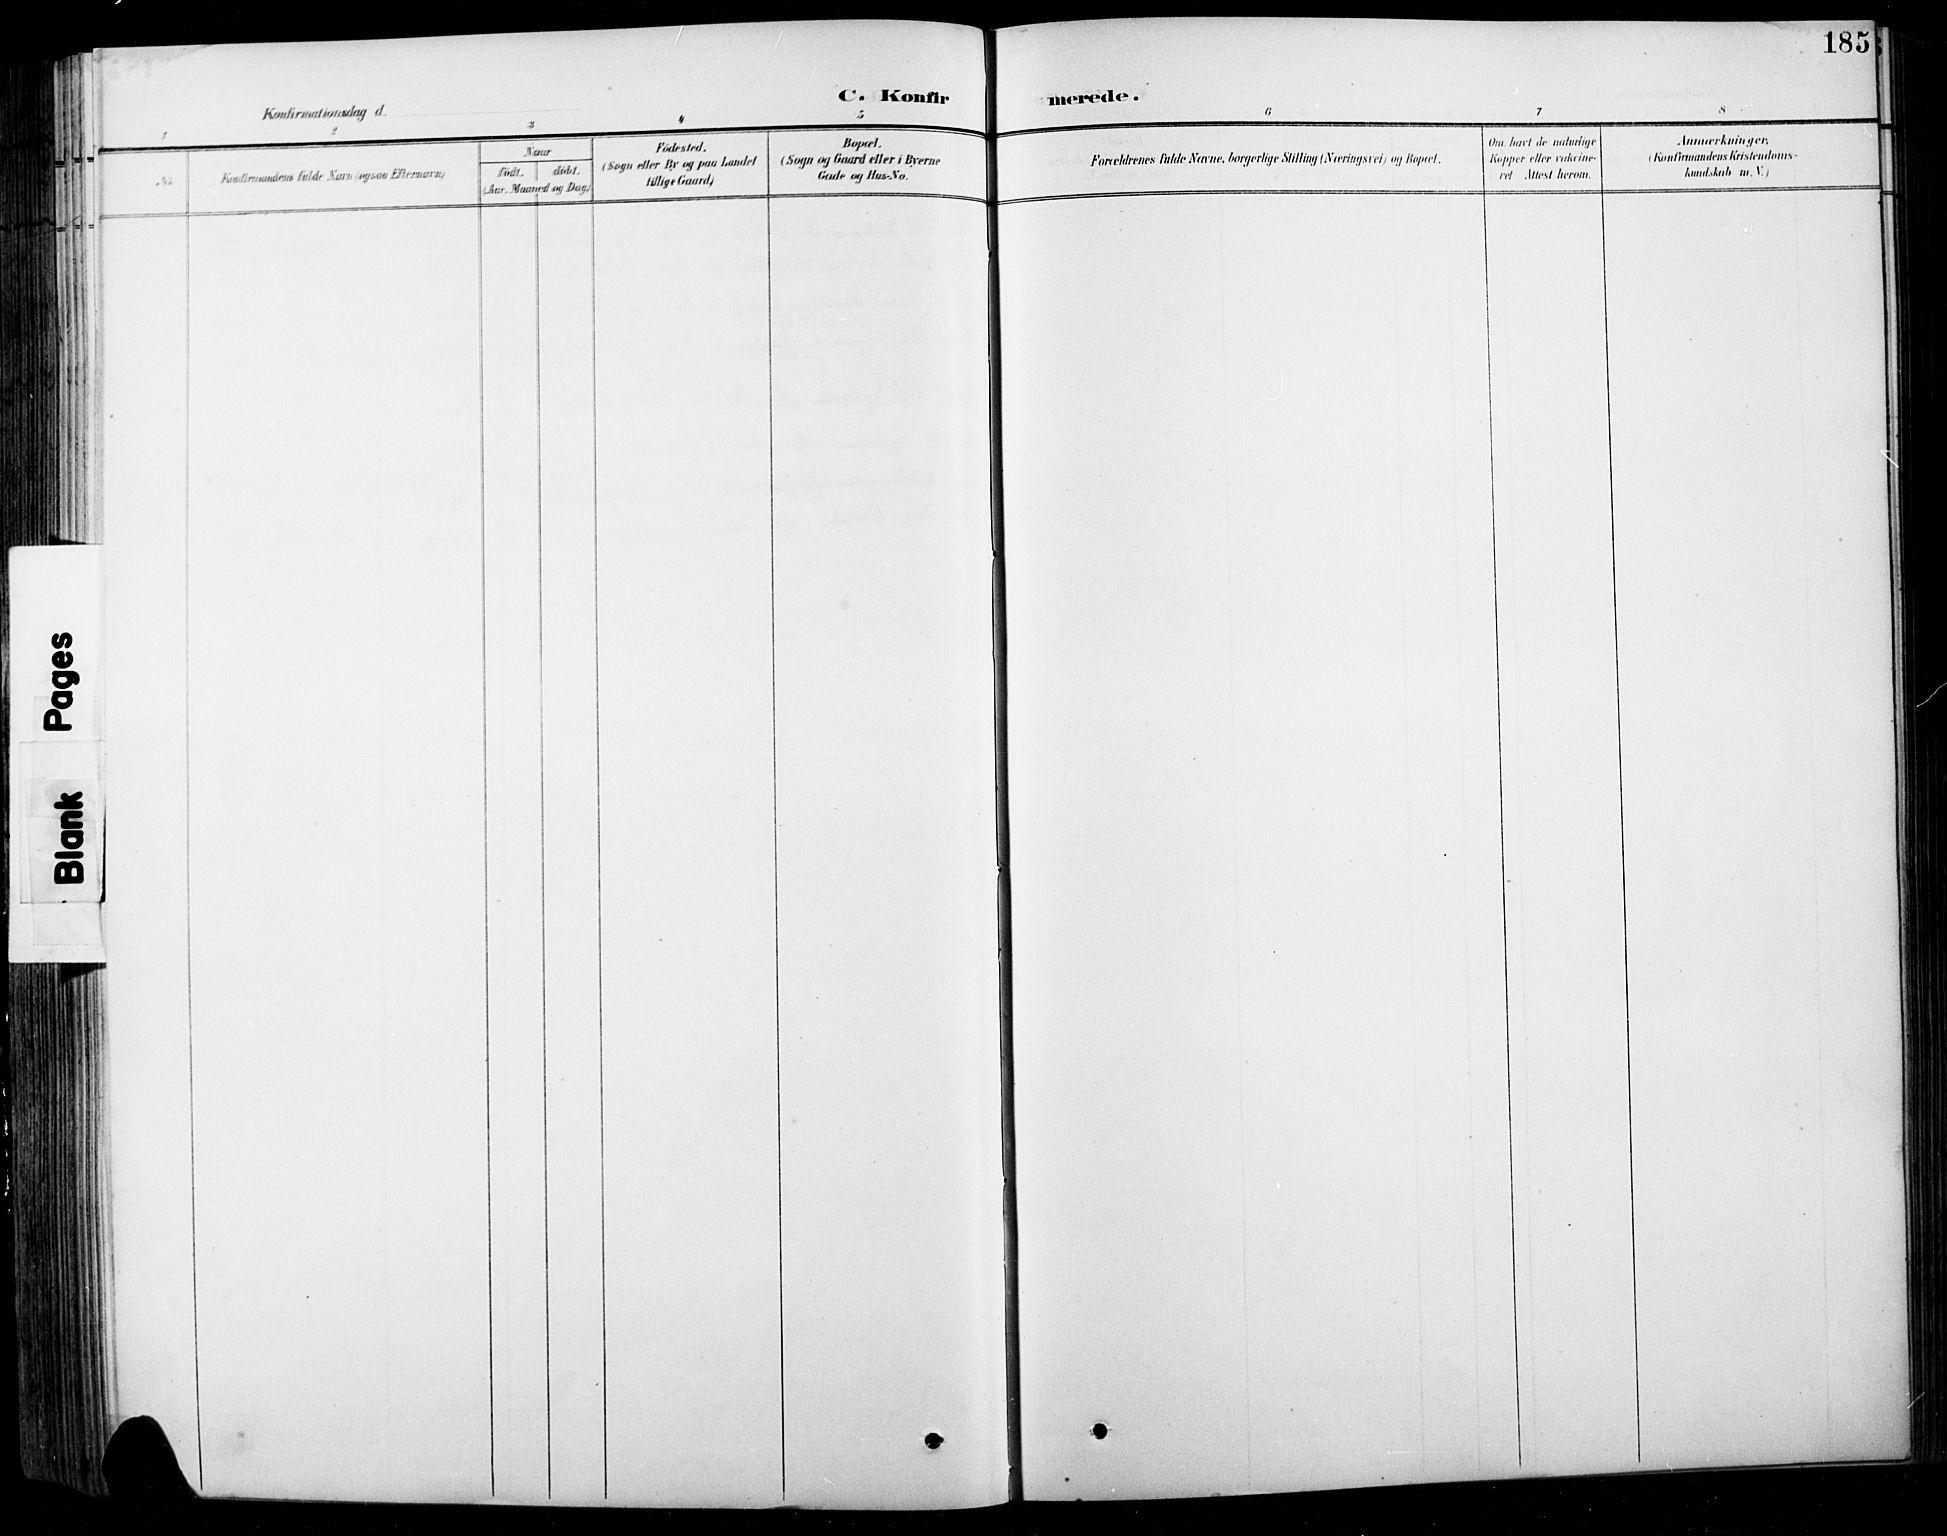 SAH, Sel prestekontor, Klokkerbok nr. 1, 1894-1923, s. 185